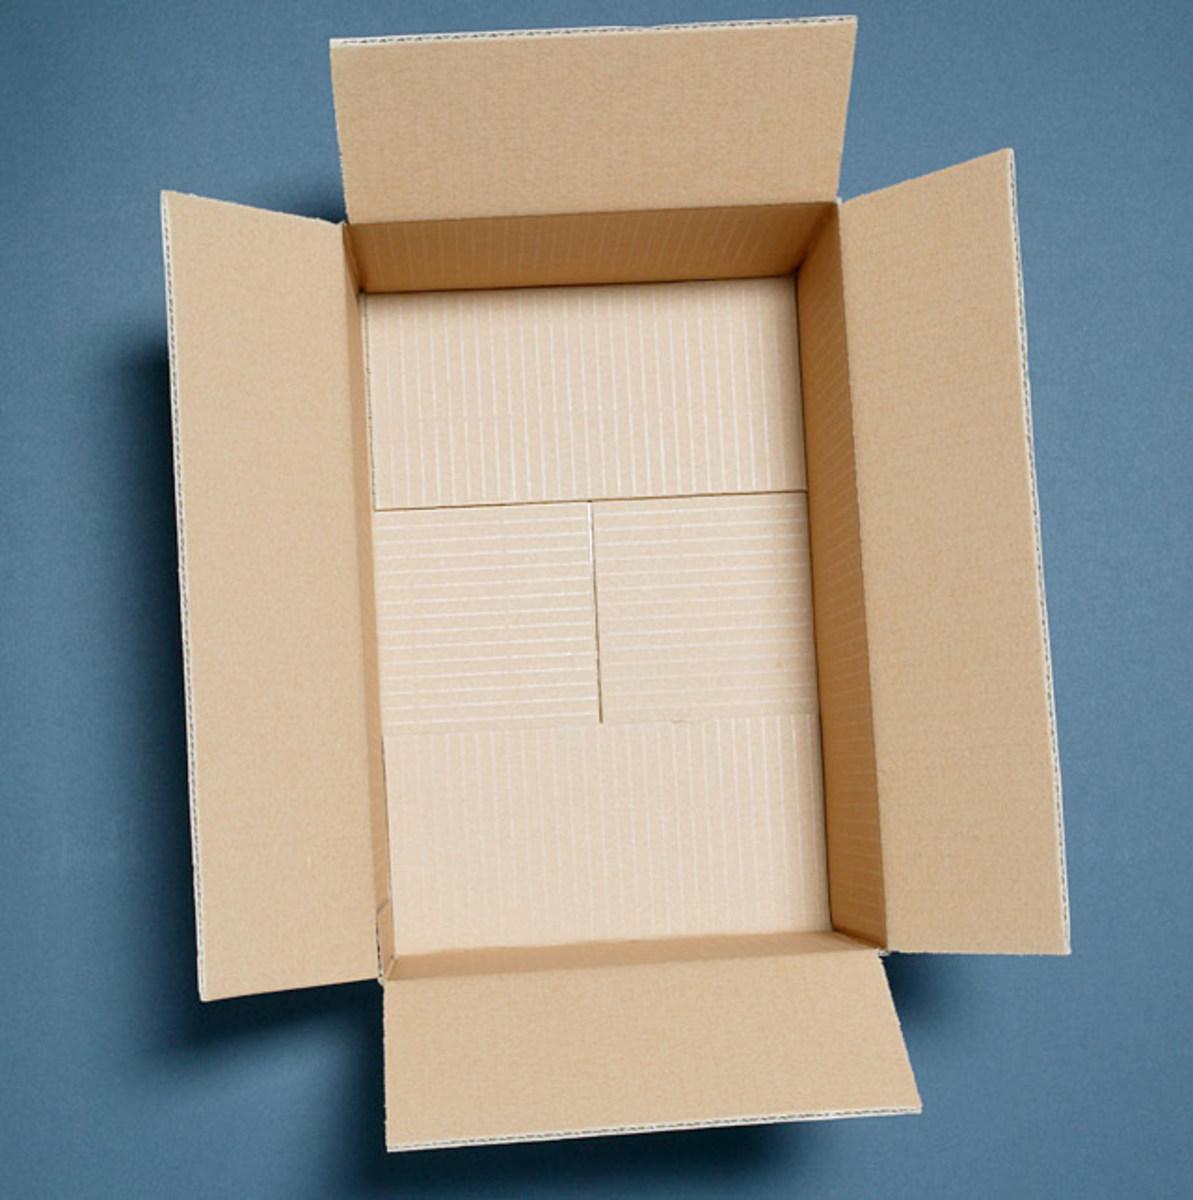 131011163155-012813-empty-box-single-image-cut.jpg